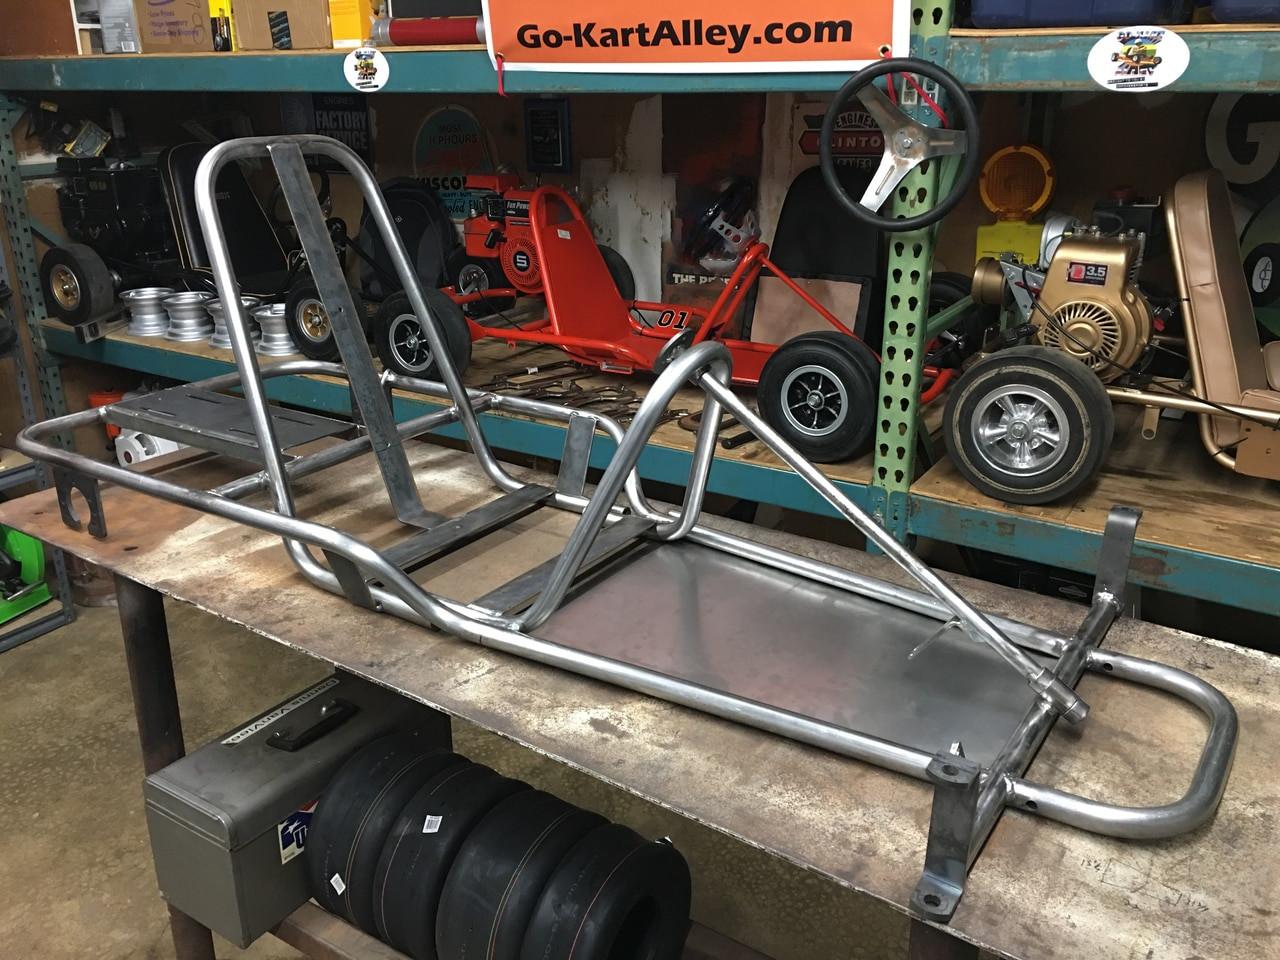 Best ideas about DIY Go Kart Kits . Save or Pin Go Kart Kit Frame XL GoPowerSports Now.